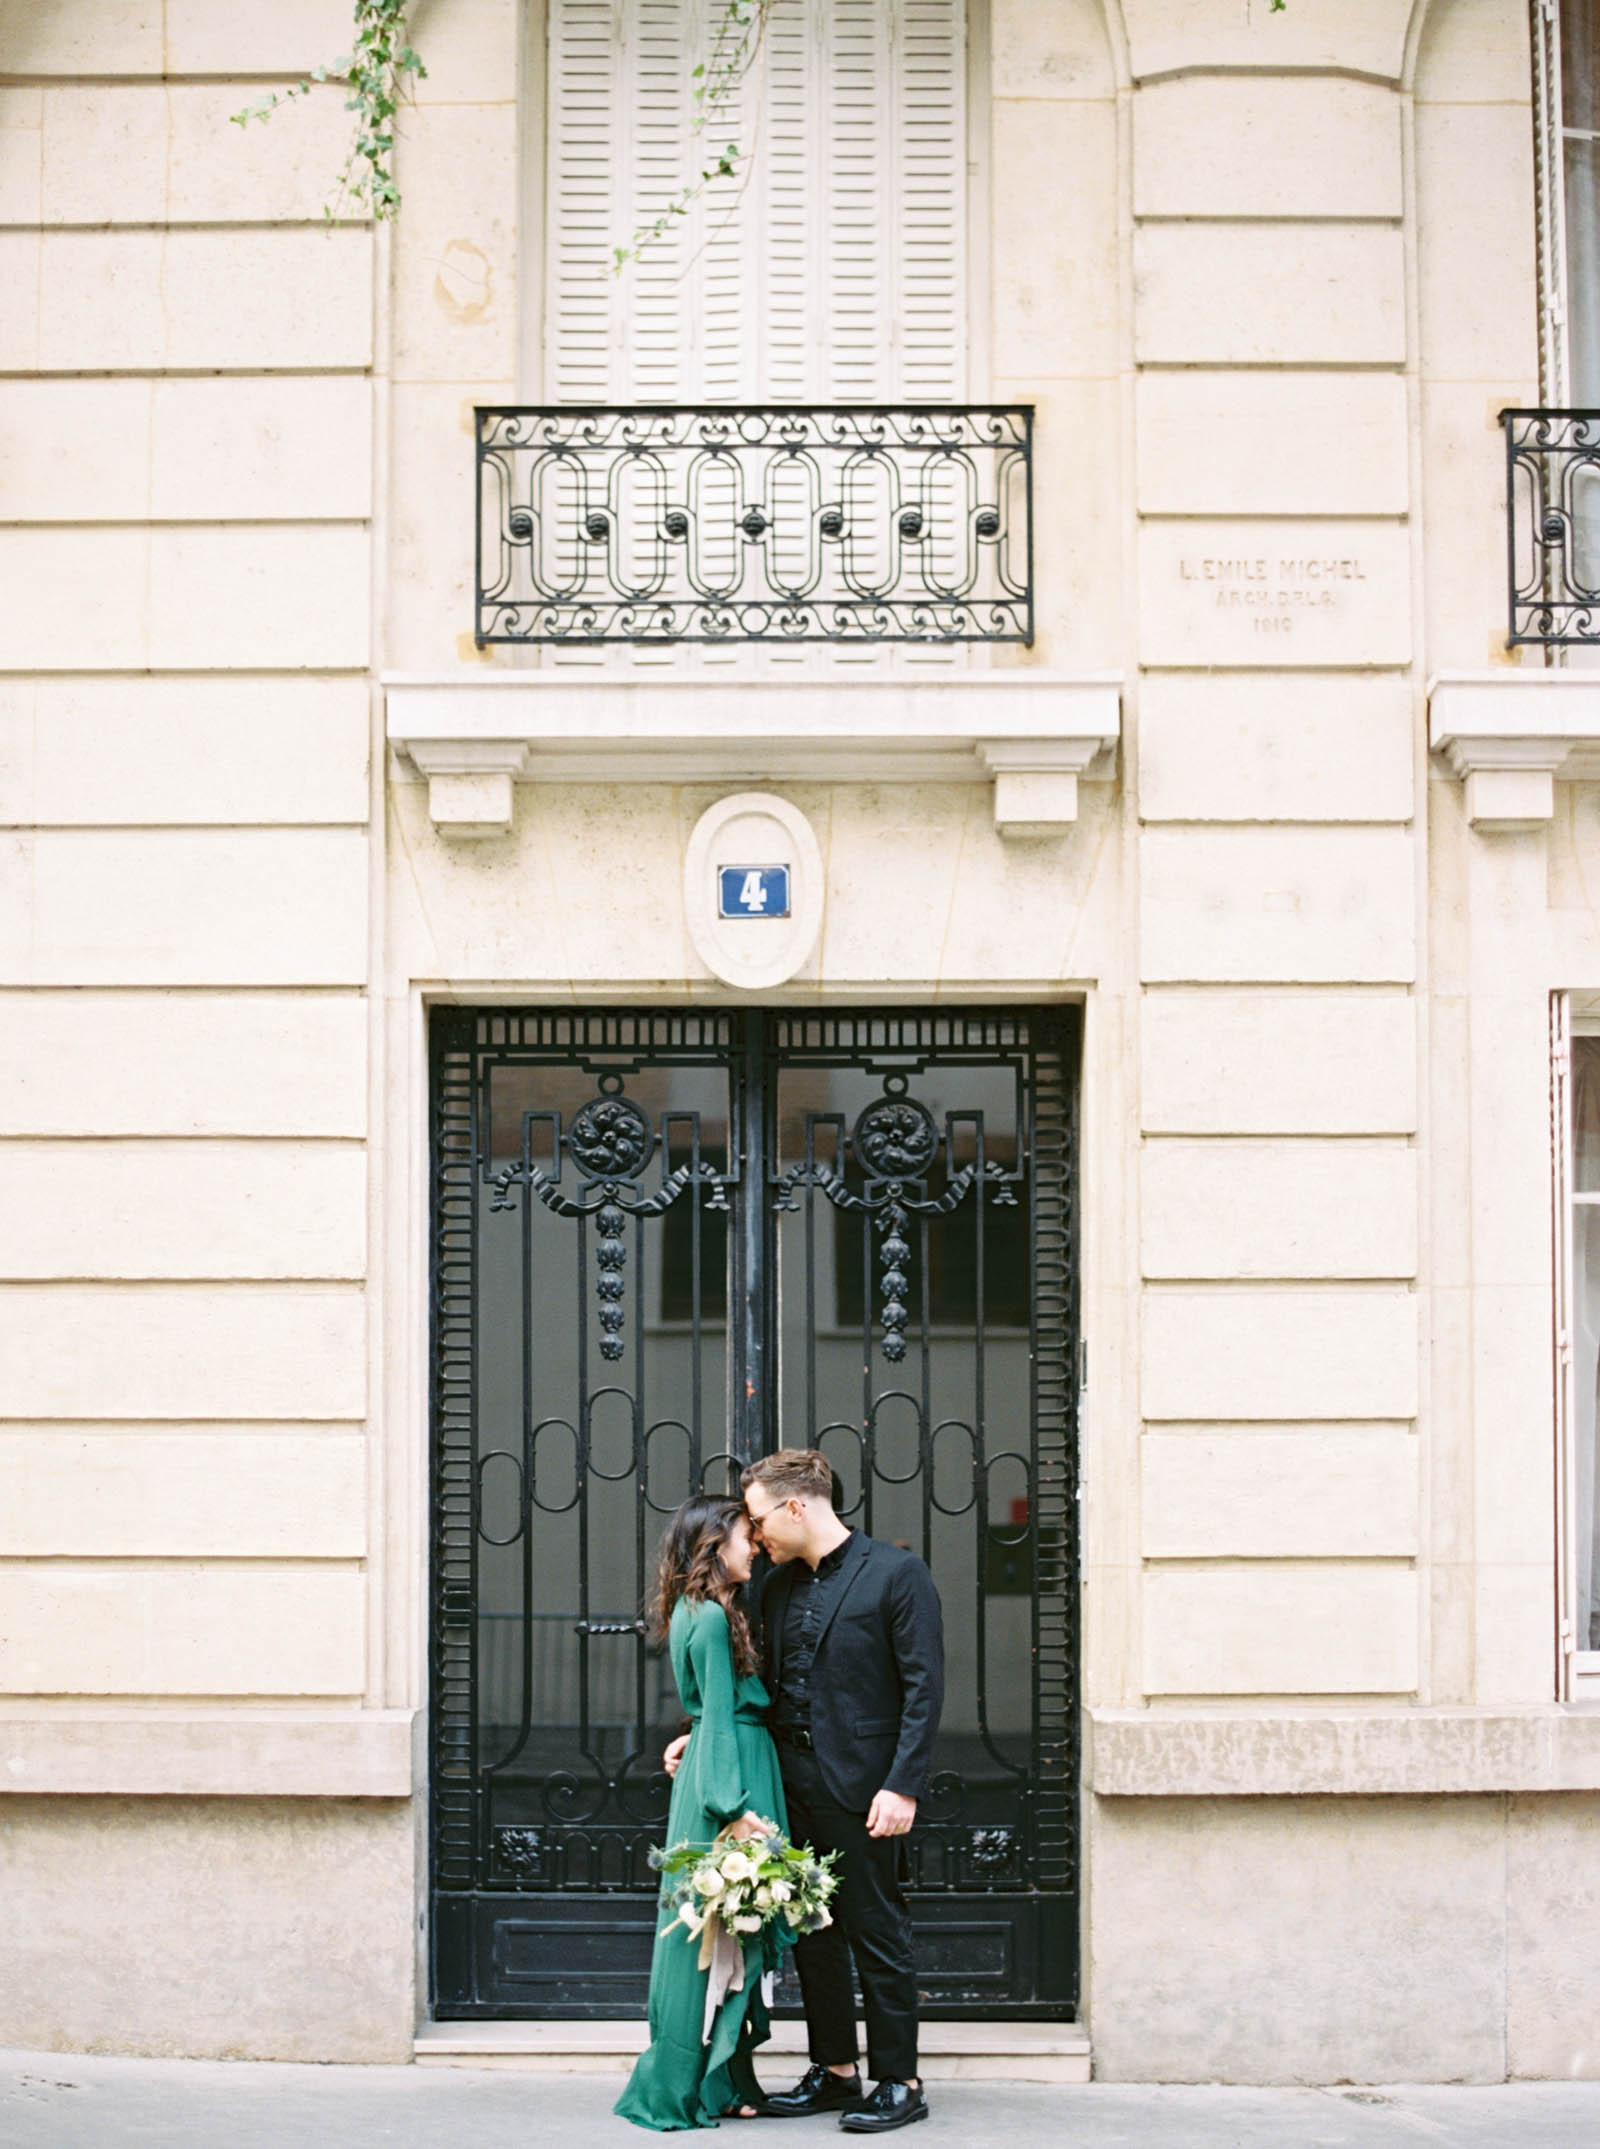 Europen Doors - Paris Engagement Photos - KR Moreno